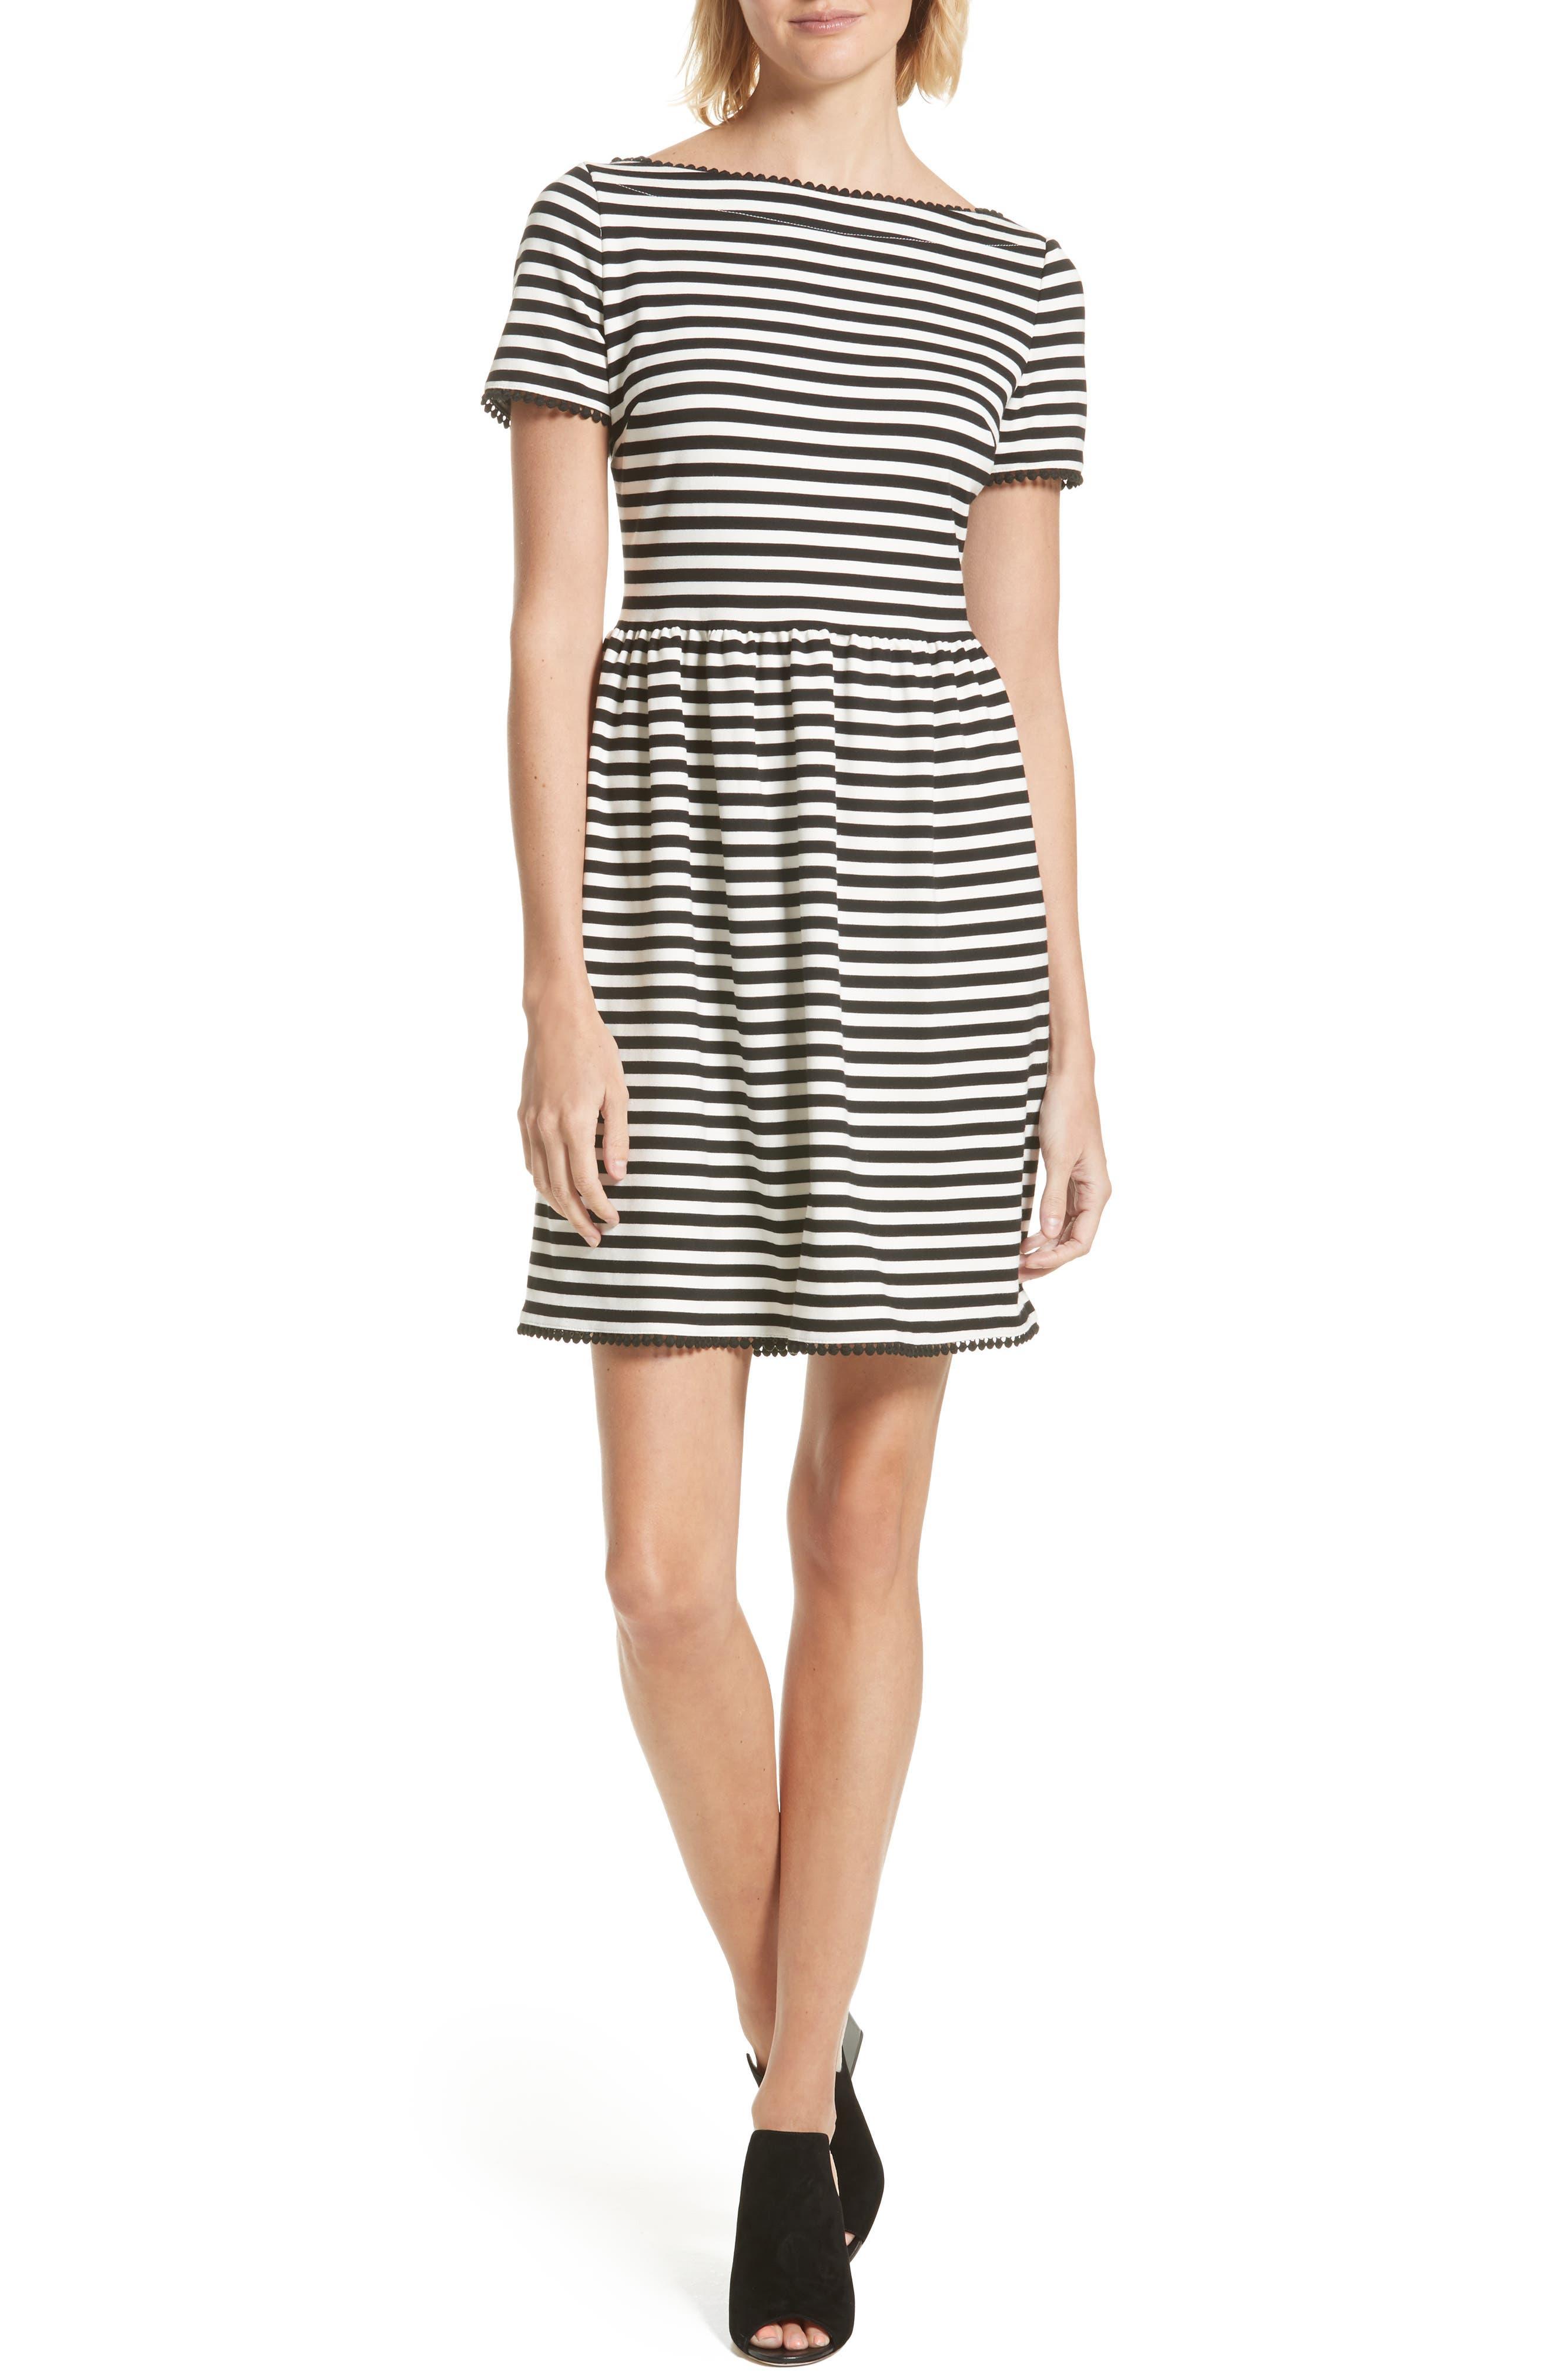 KATE SPADE NEW YORK,                             stripe ponte dress,                             Main thumbnail 1, color,                             900